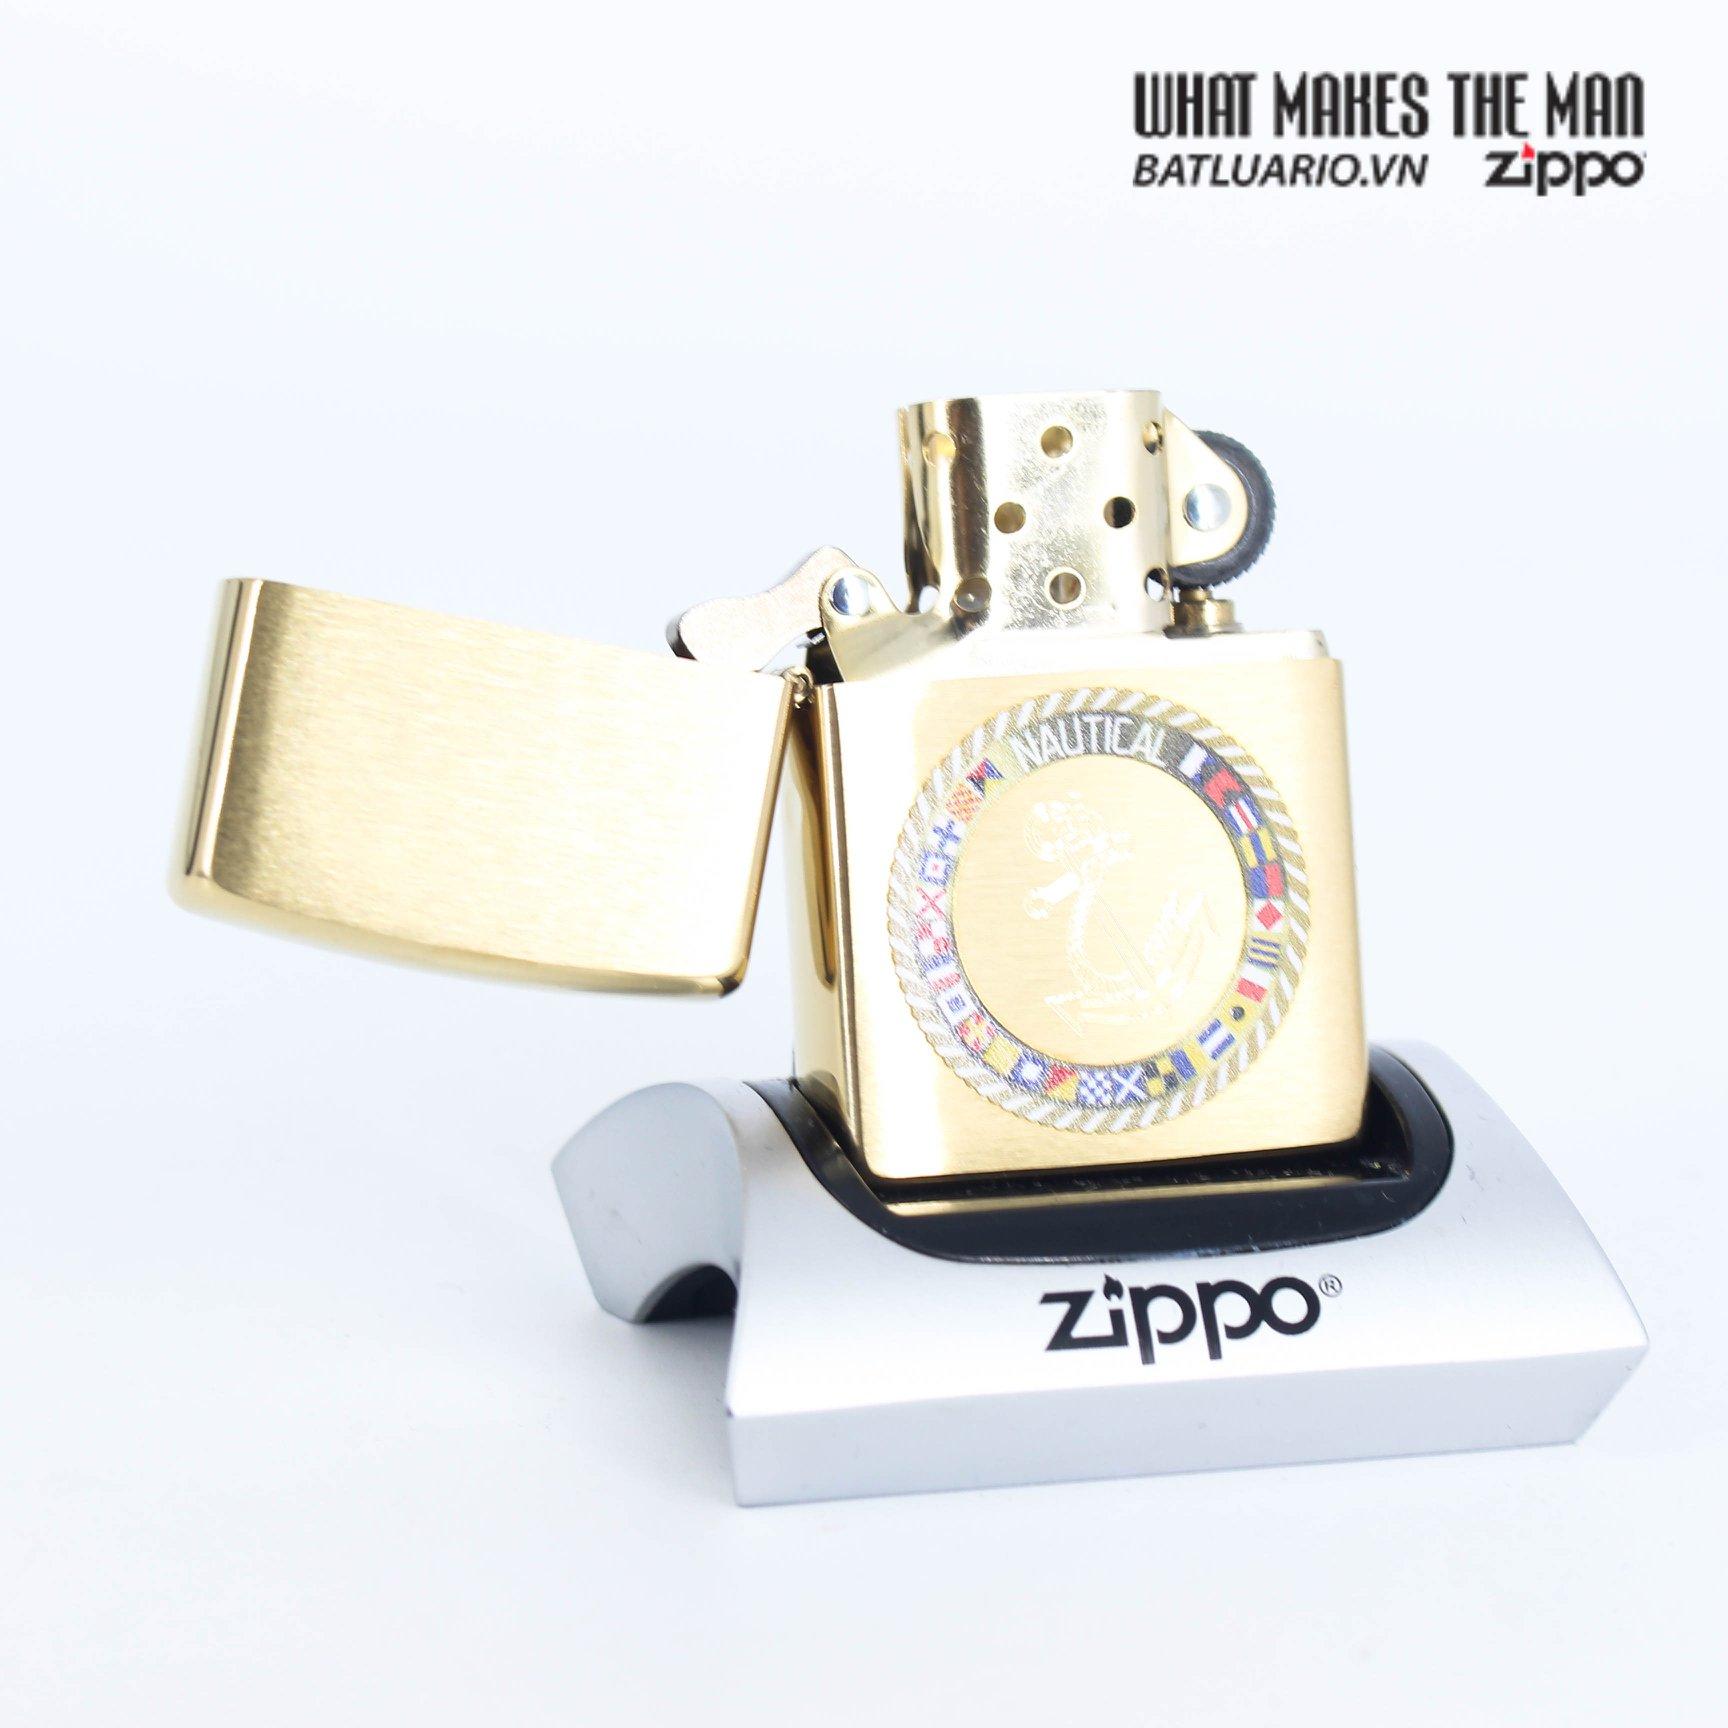 Zippo 49128 - Zippo Nautical Flags Design Brushed Brass 2